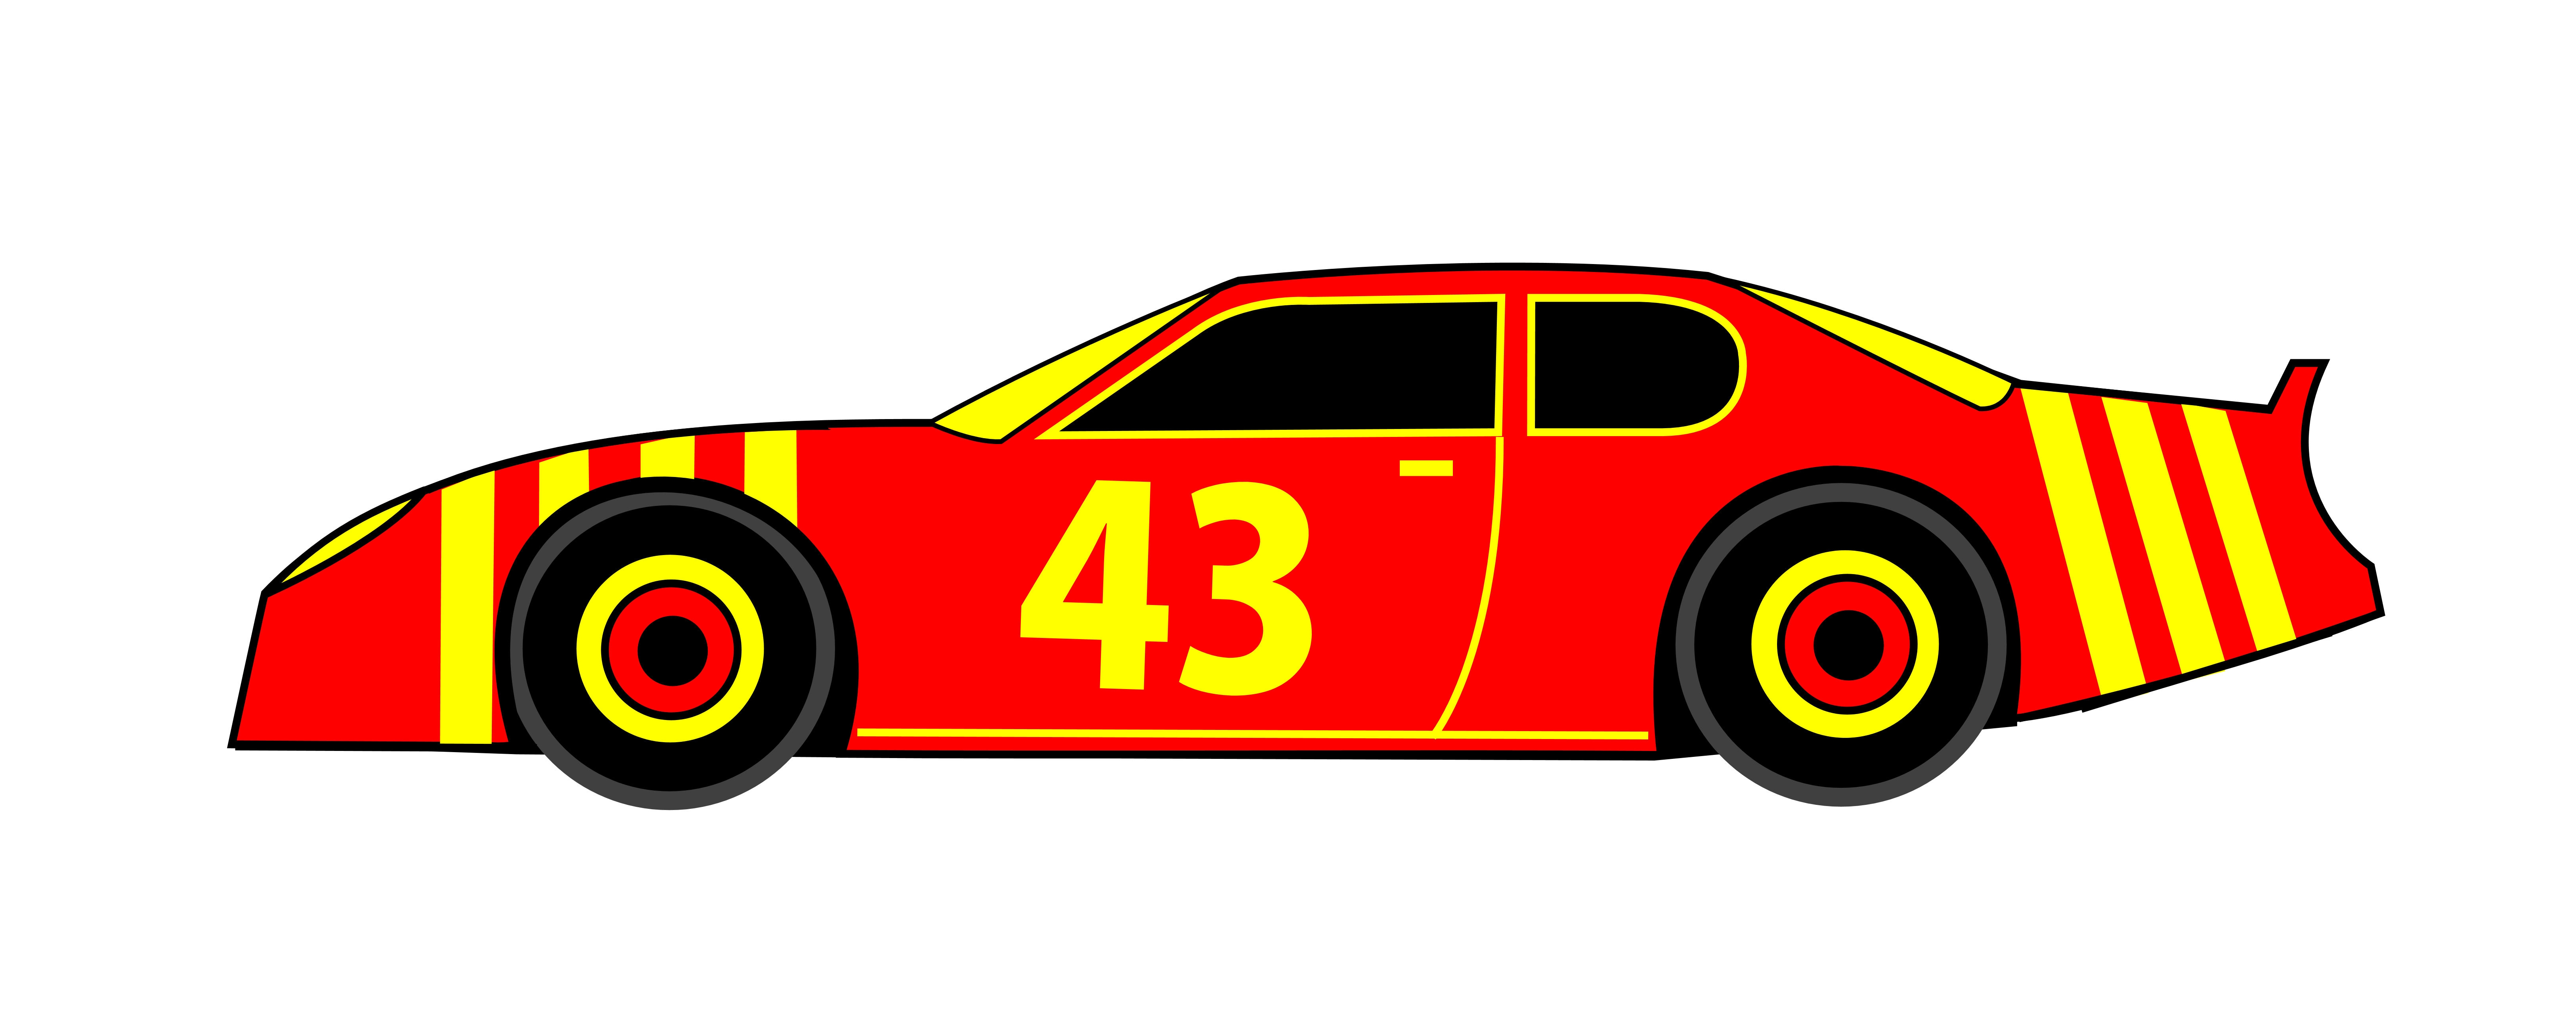 6500x2555 Race Car Clip Art